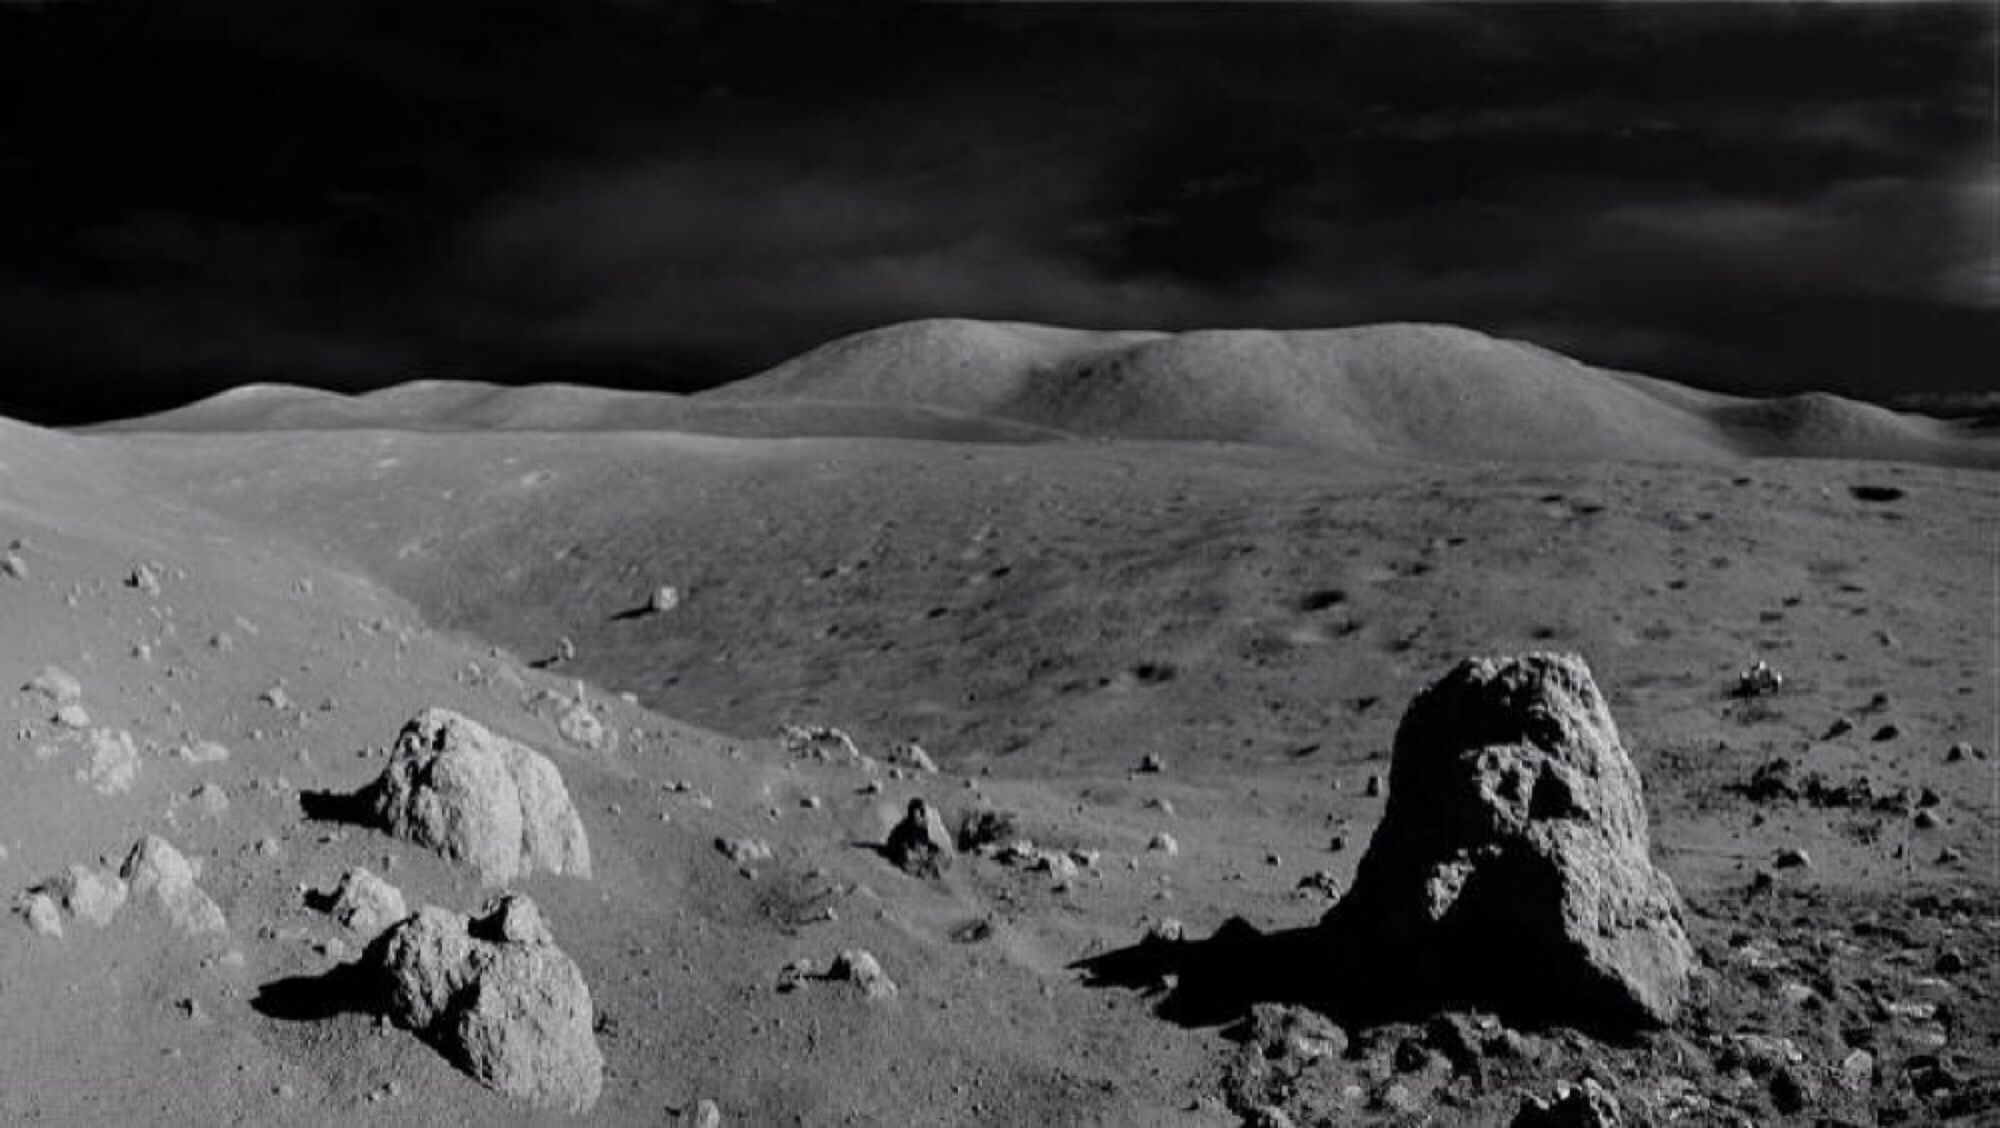 Pin by Shavard Elliott on Strange Moon surface, Nasa